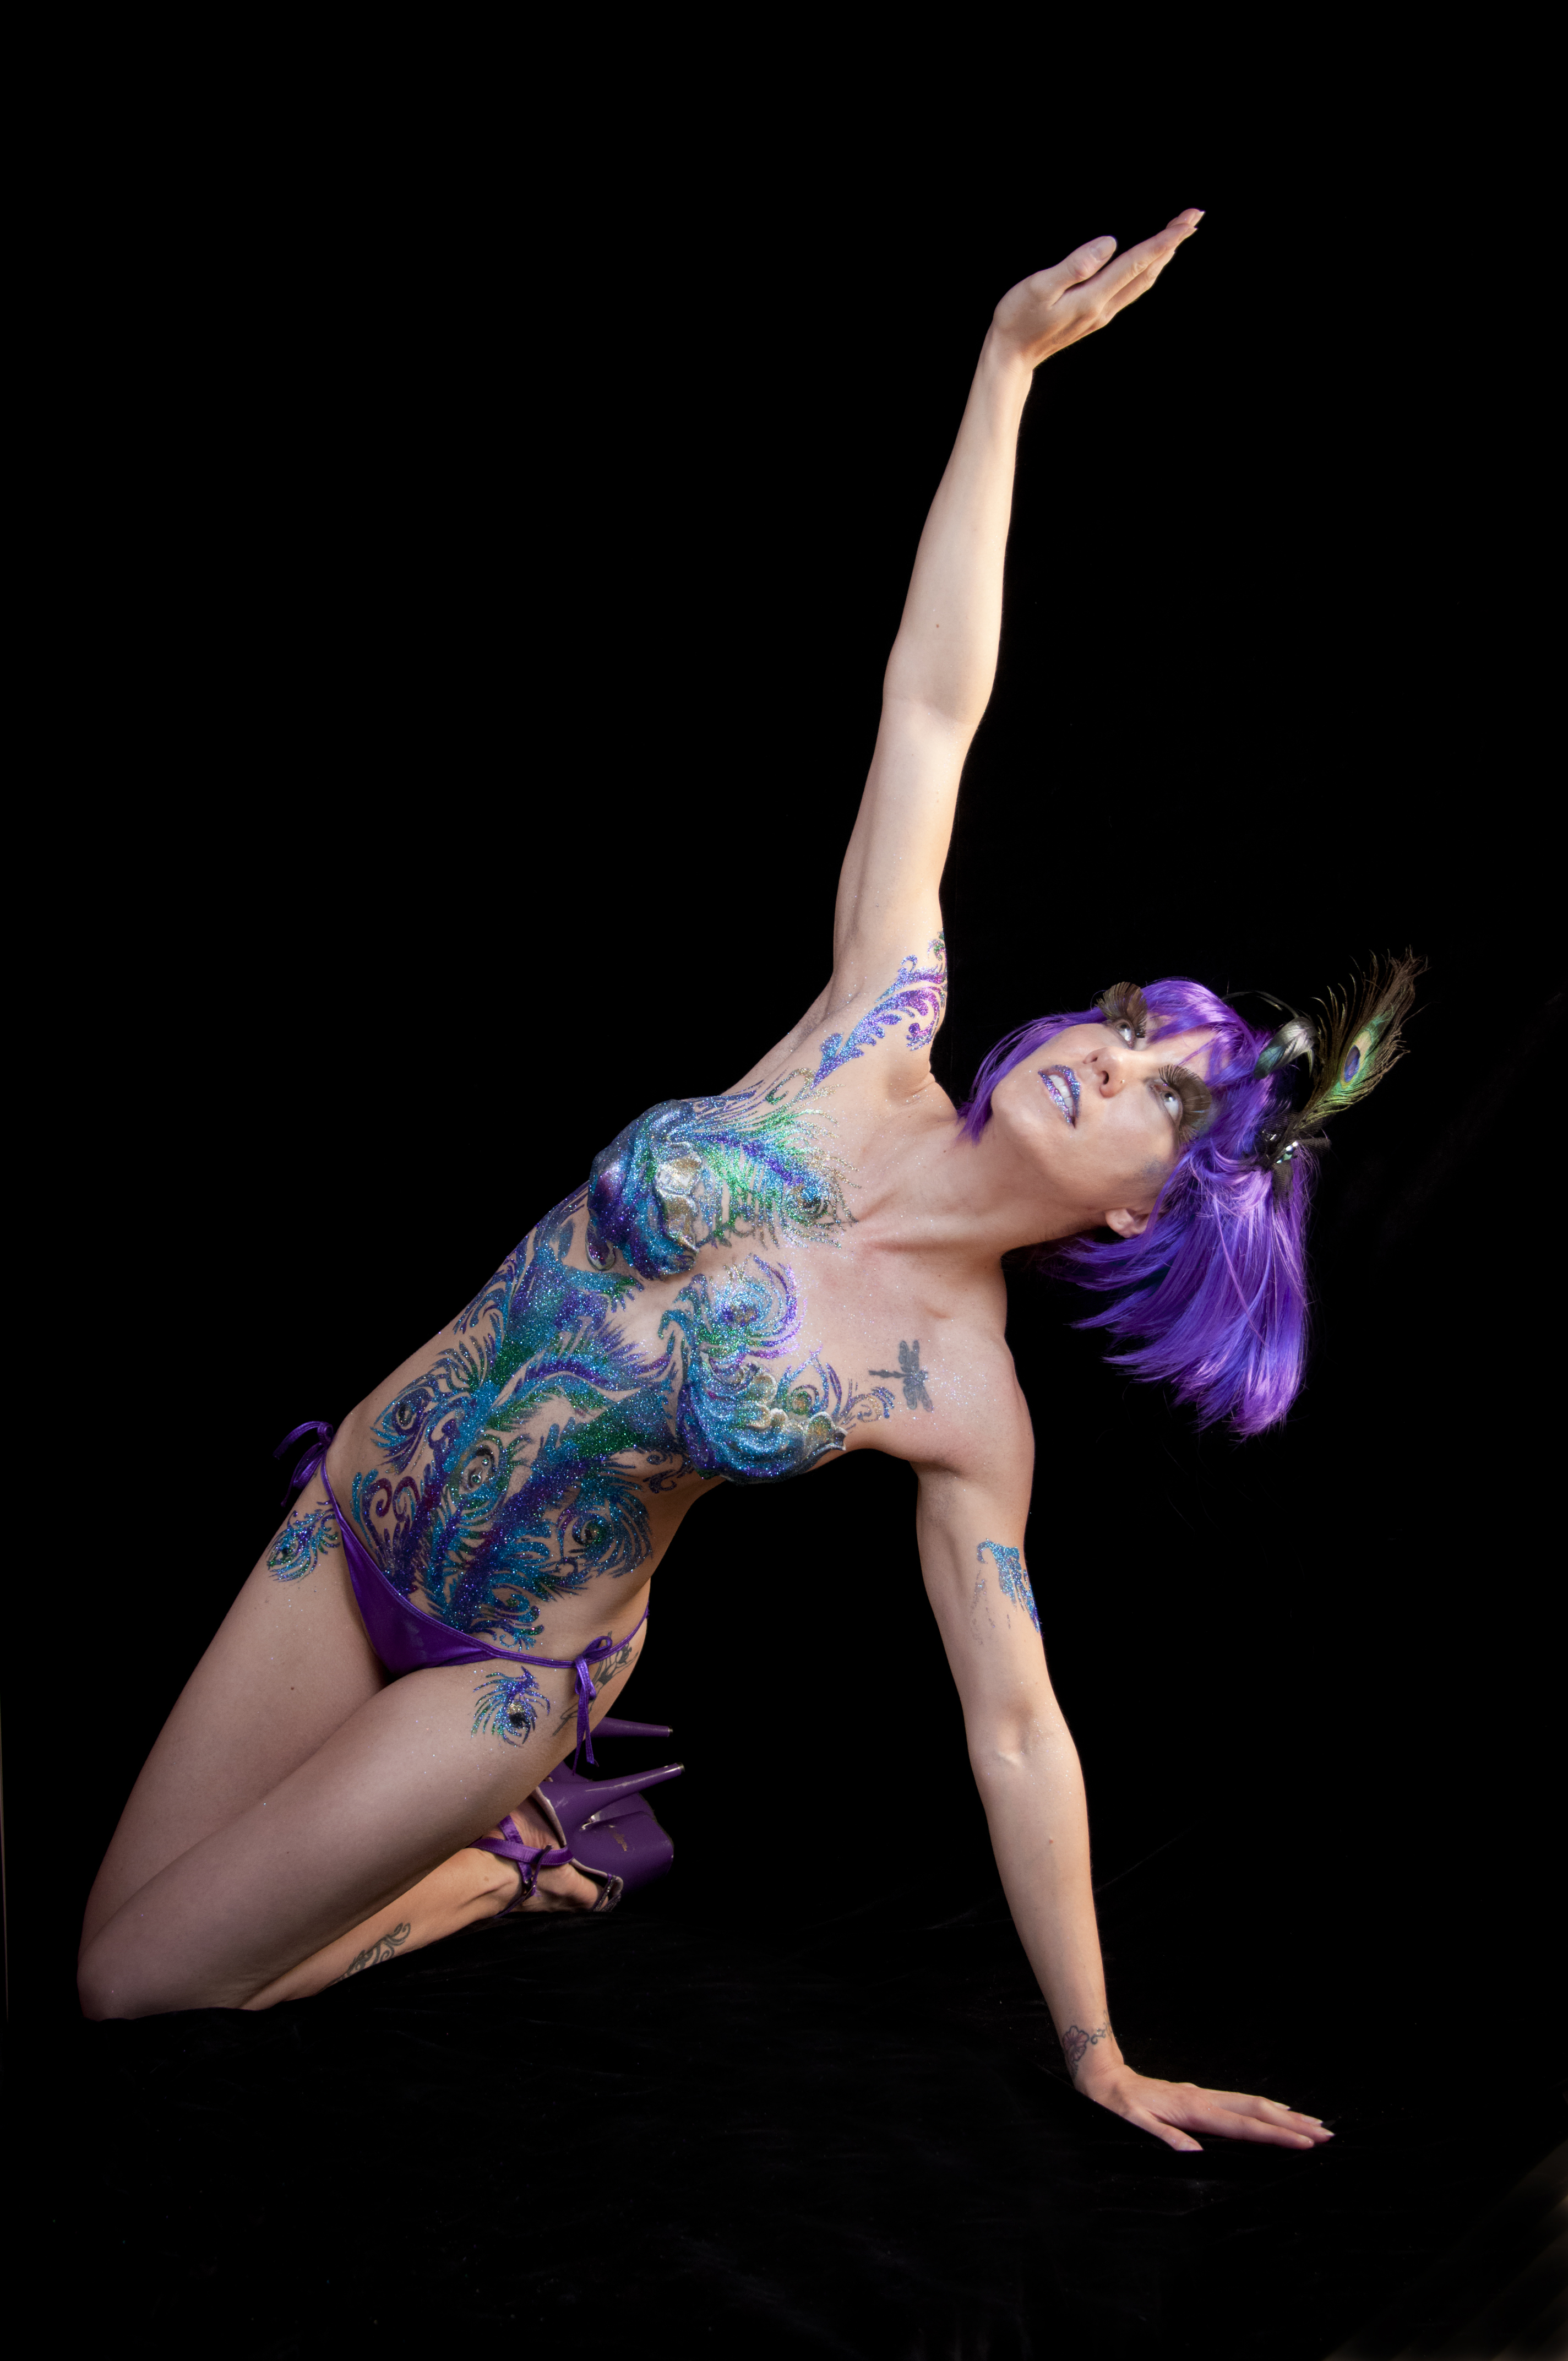 symone body glitter tatt knelt body painting by cat. Black Bedroom Furniture Sets. Home Design Ideas